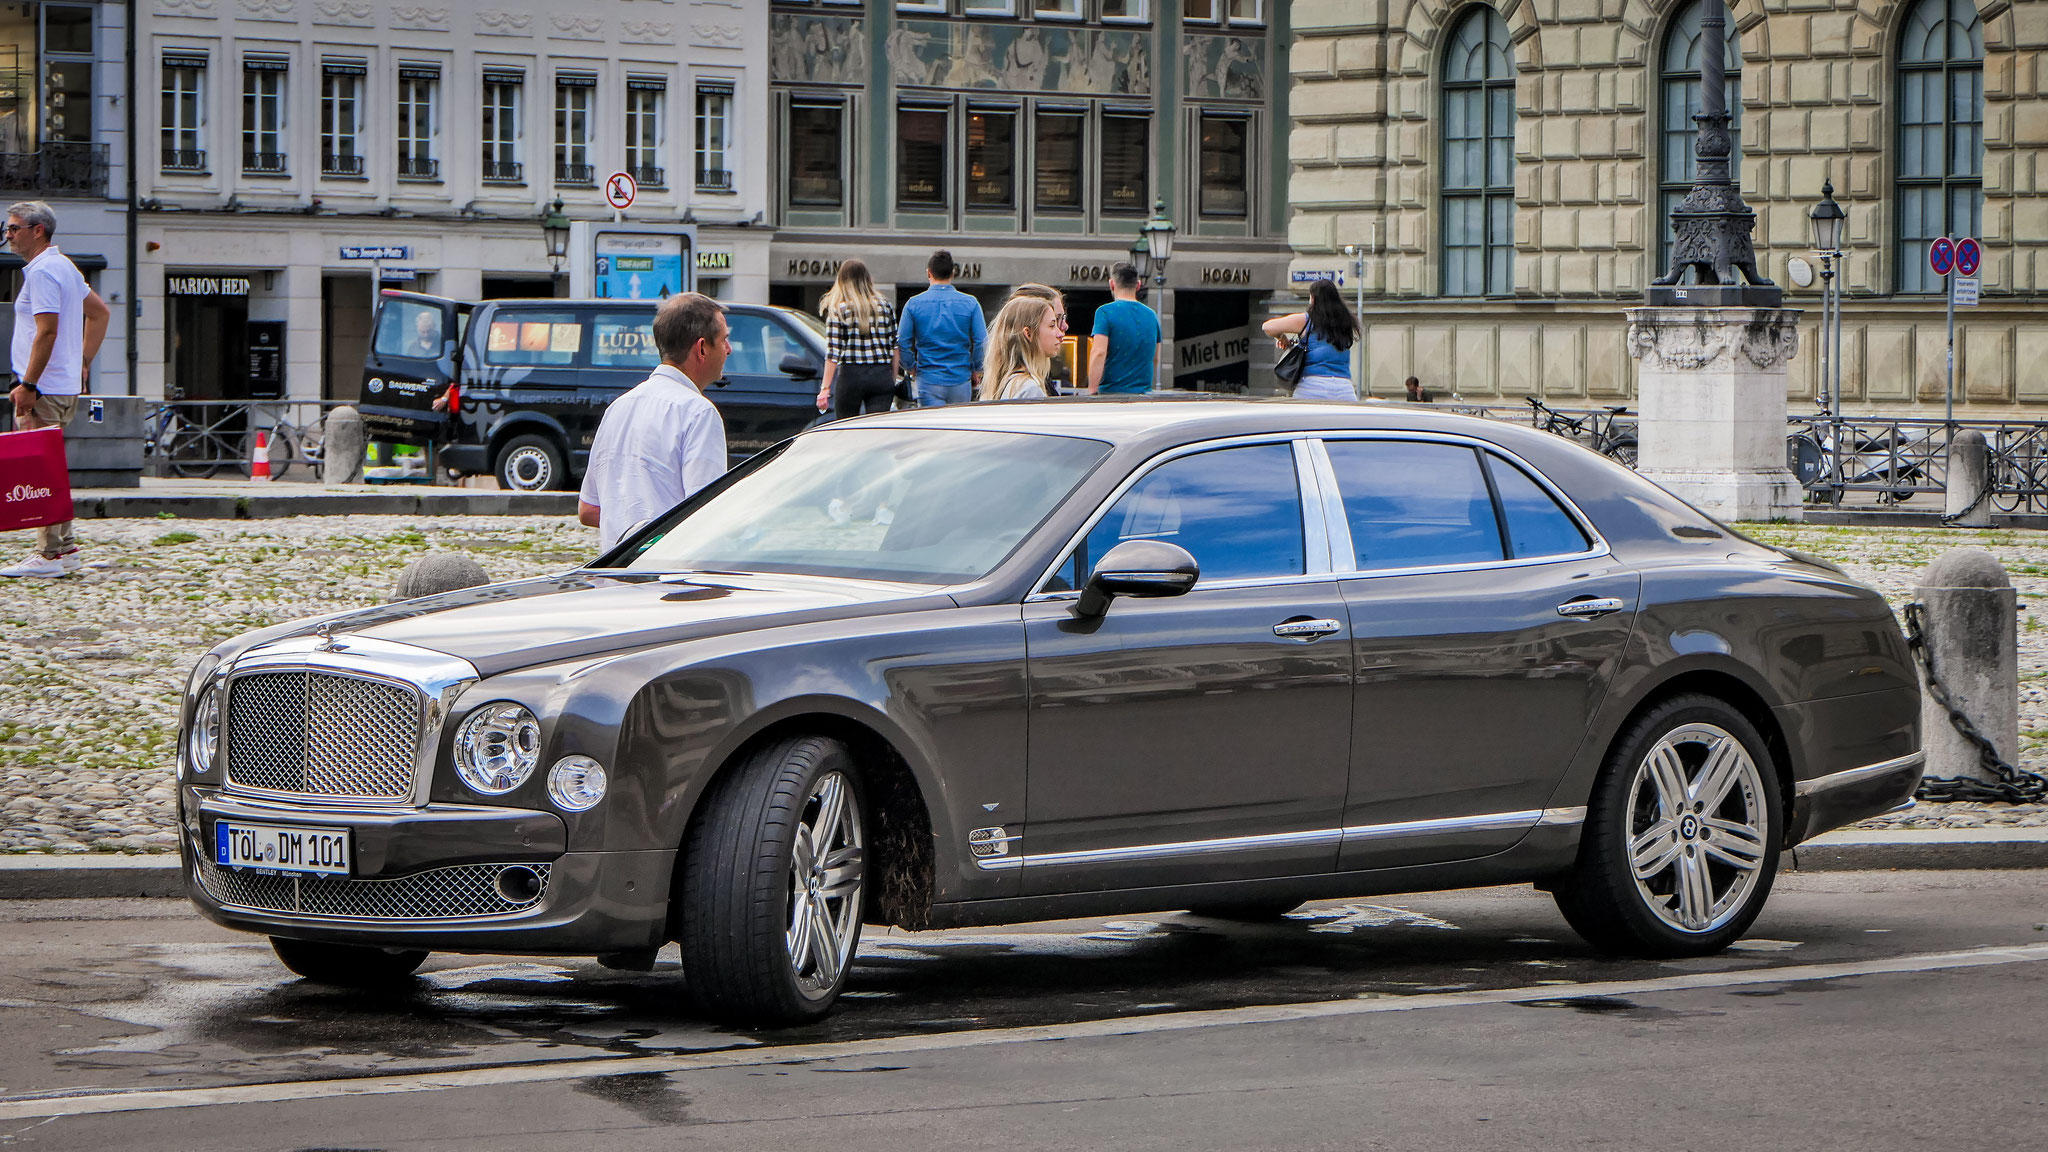 Bentley Mulsanne - TÖL-DM-101